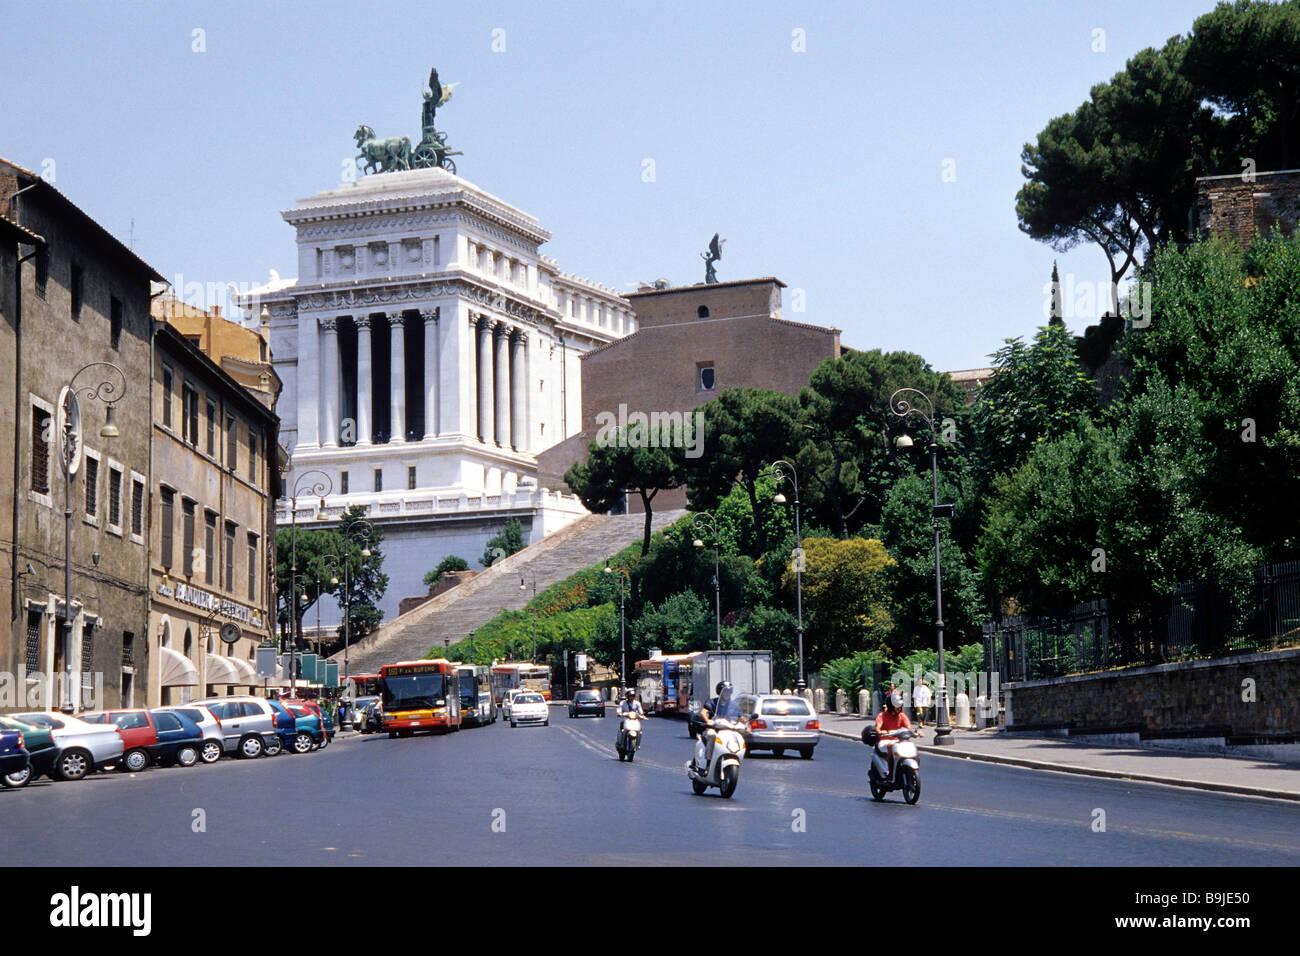 Vittoriano, monument à Vittorio Emanuele II, l'autel de la patrie, l'impériale memorial, Via del Photo Stock